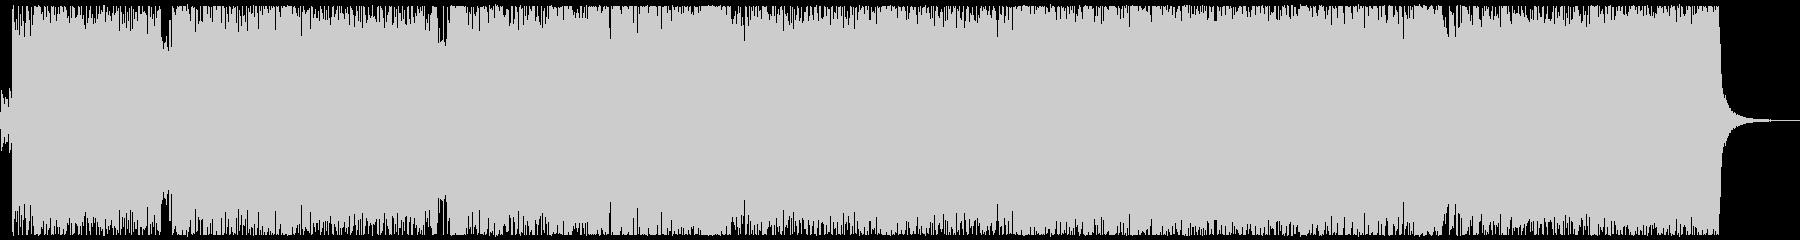 VP系3、レース番組、ギターロックAの未再生の波形